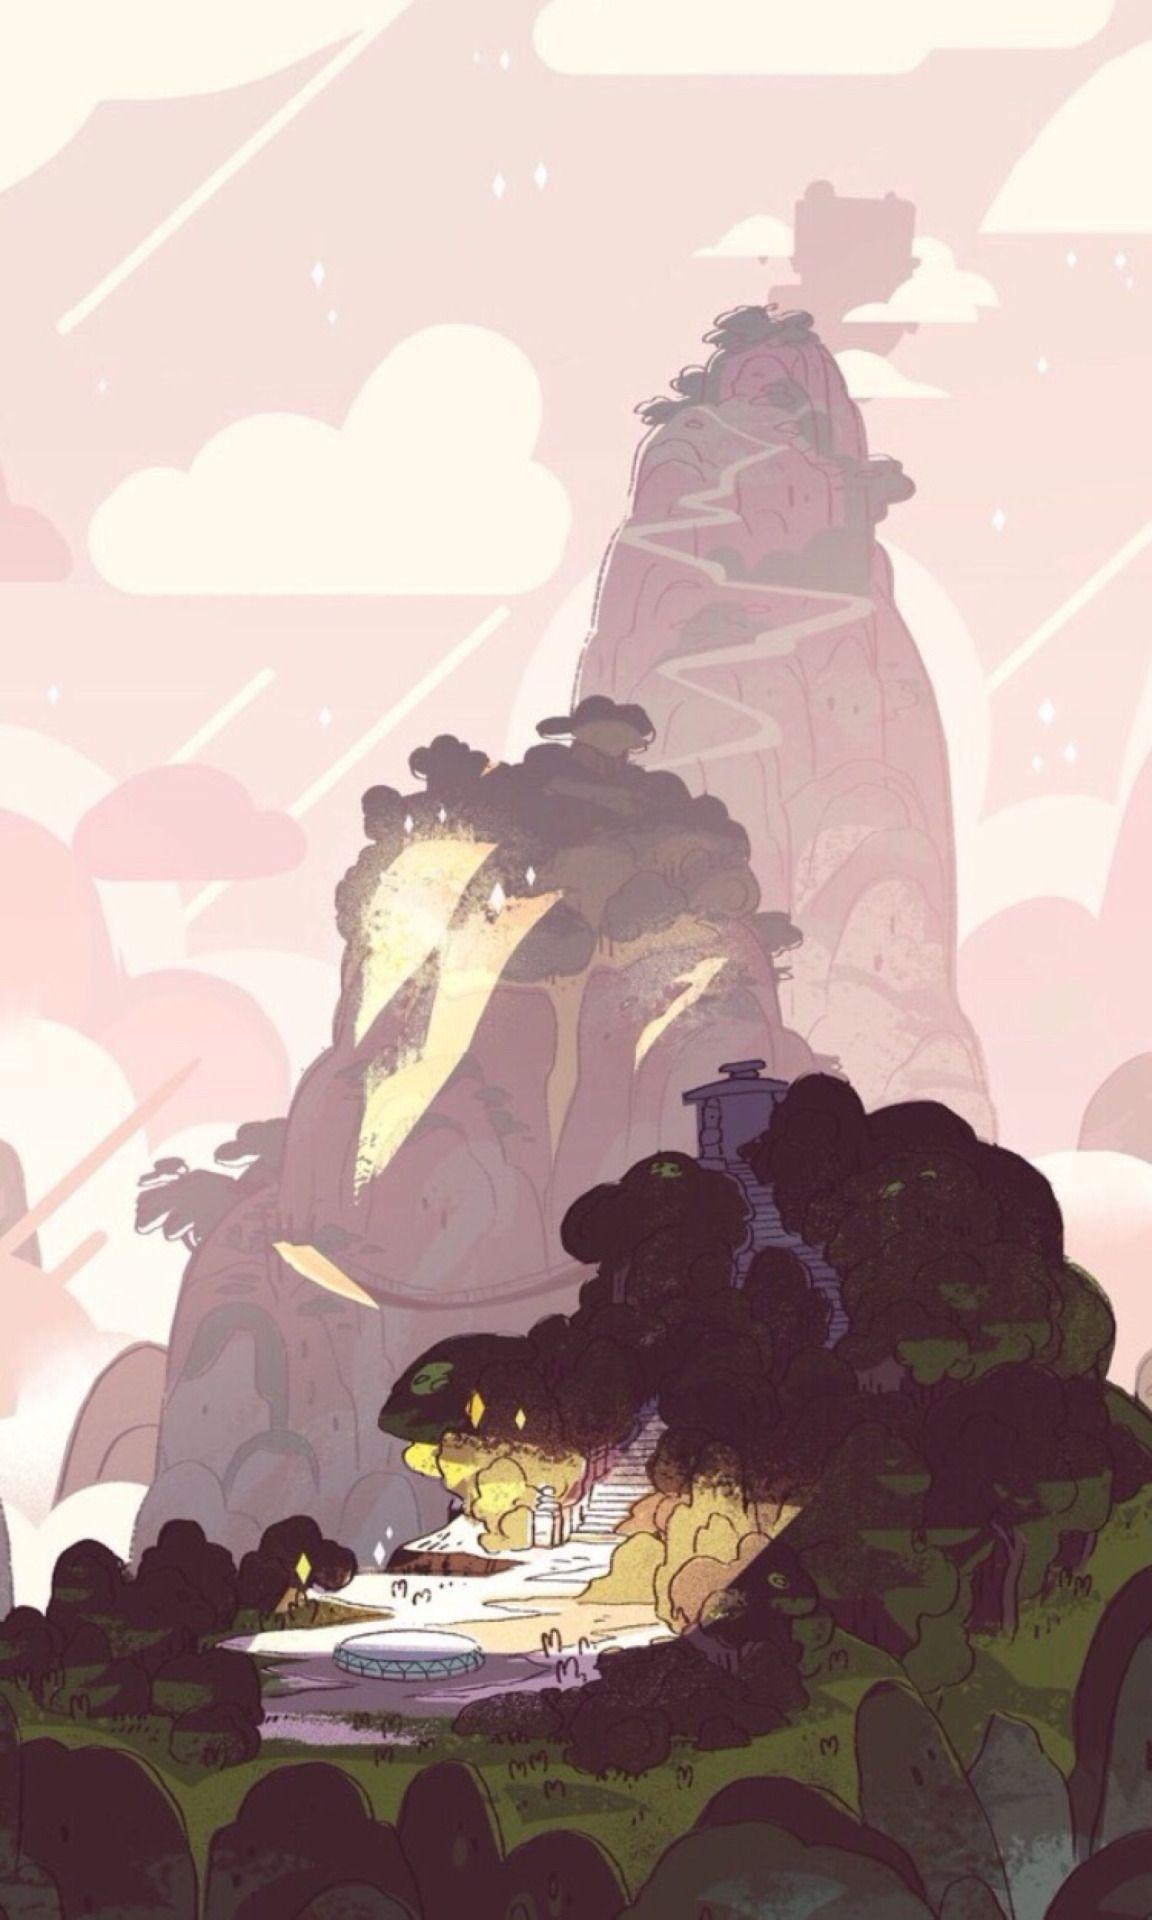 cartoon network pink backgrounds SU aesthetic phone wallpaper 1152x1920